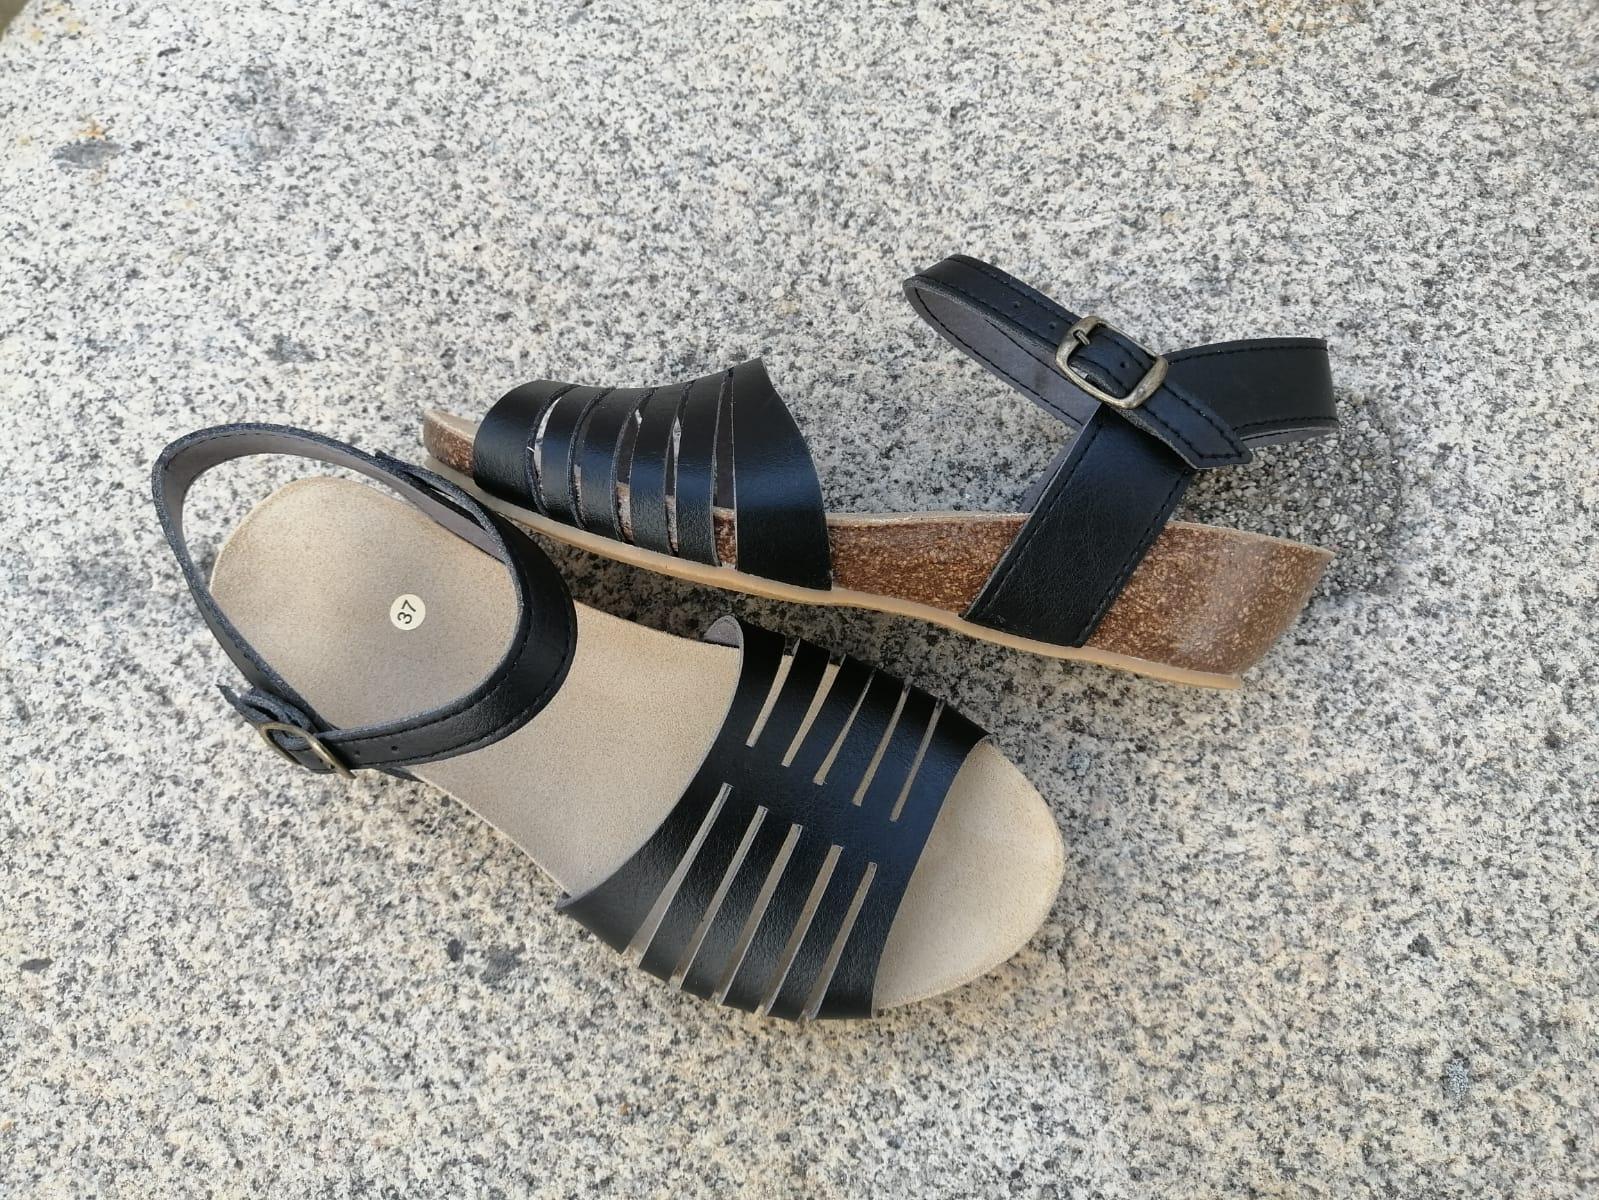 Marbella negro, Colección 100% HECHO A MANO, sandalias veganas, sandalias veganas mujer, calzado vegano, sandalias de tacón medio, sandalias bioworld, vegan shoes, sandalias negras.